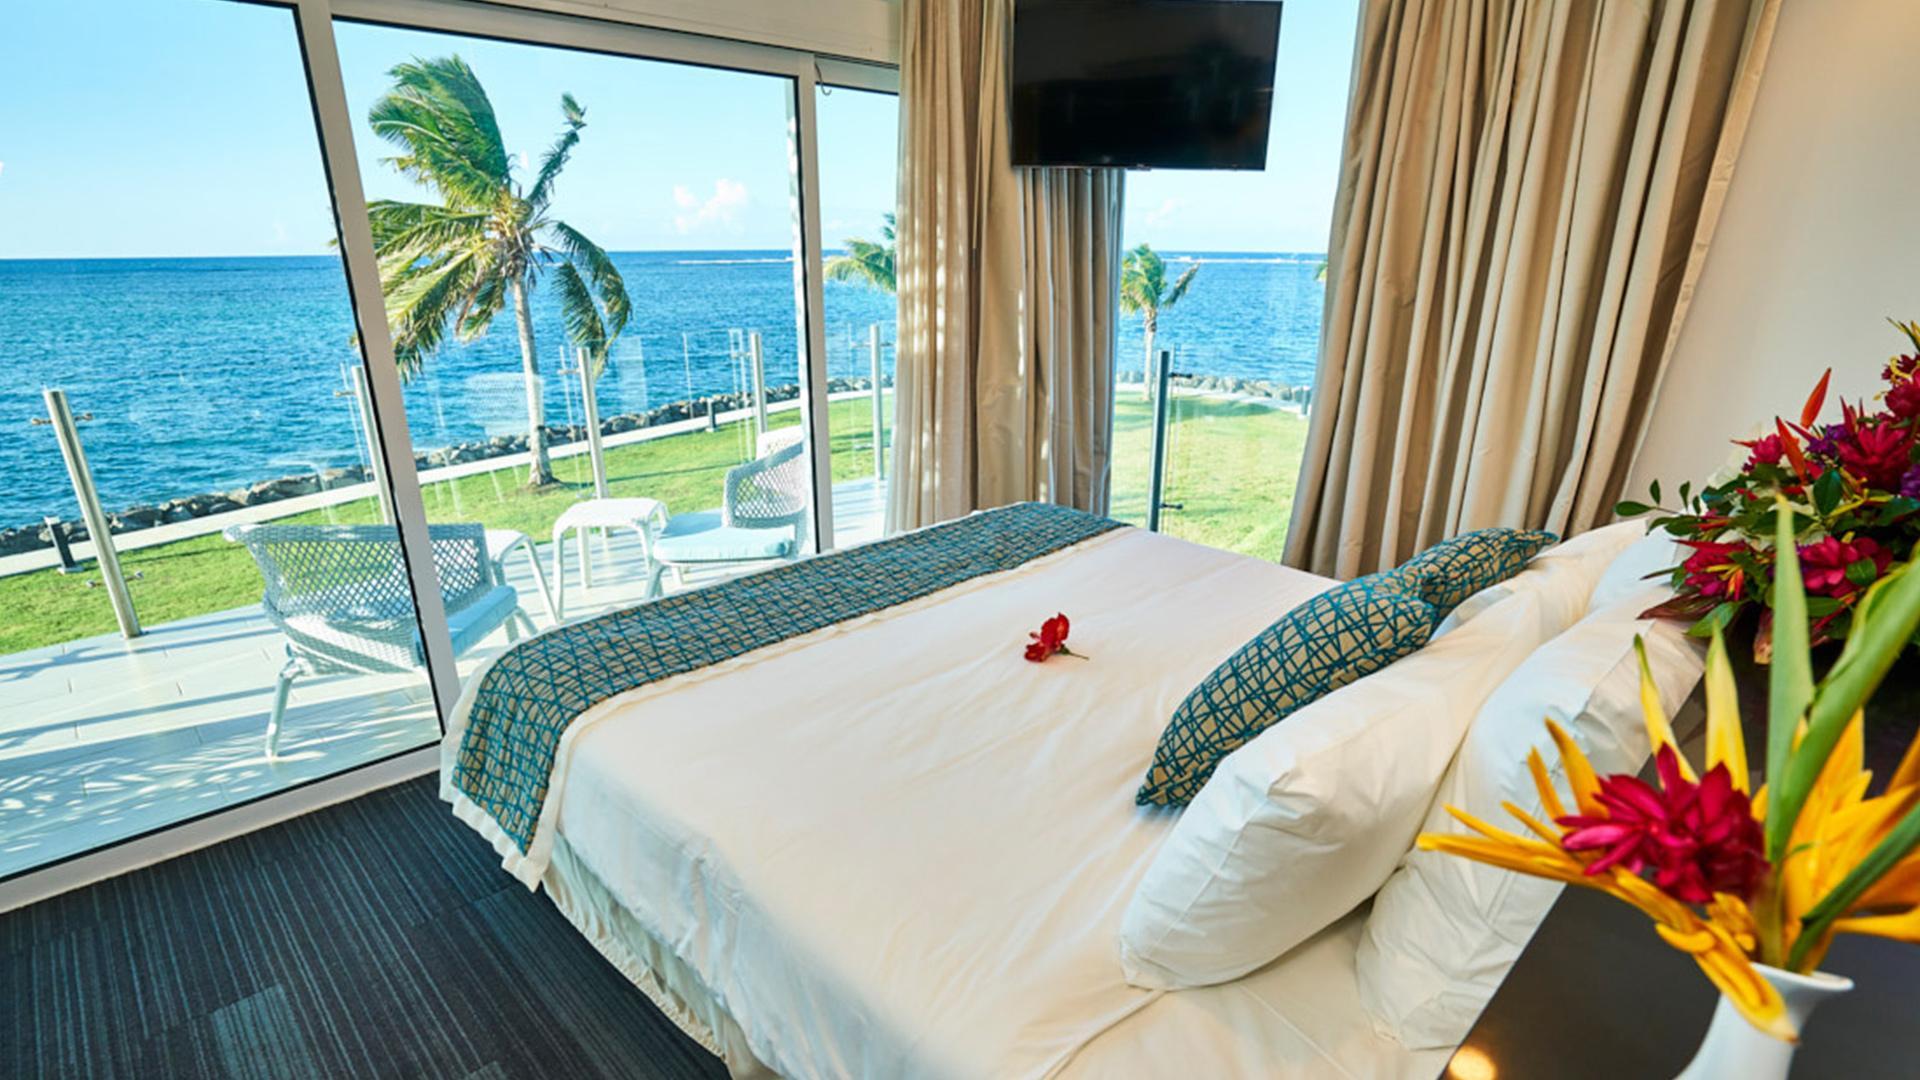 Deluxe Oceanvew King image 1 at Taumeasina Island Resort by null, Tuamasaga, Samoa